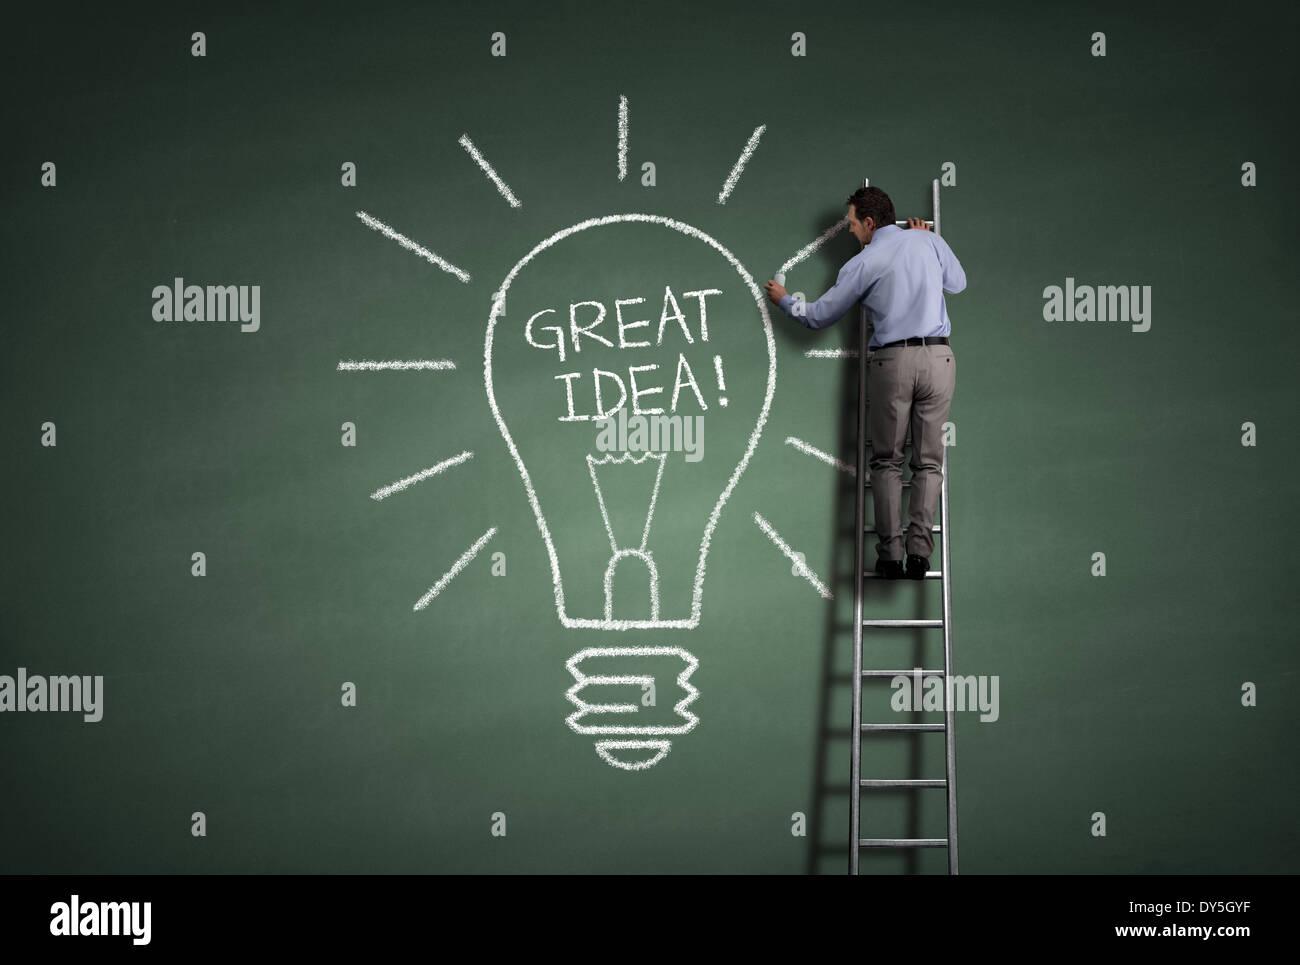 Great idea - Stock Image